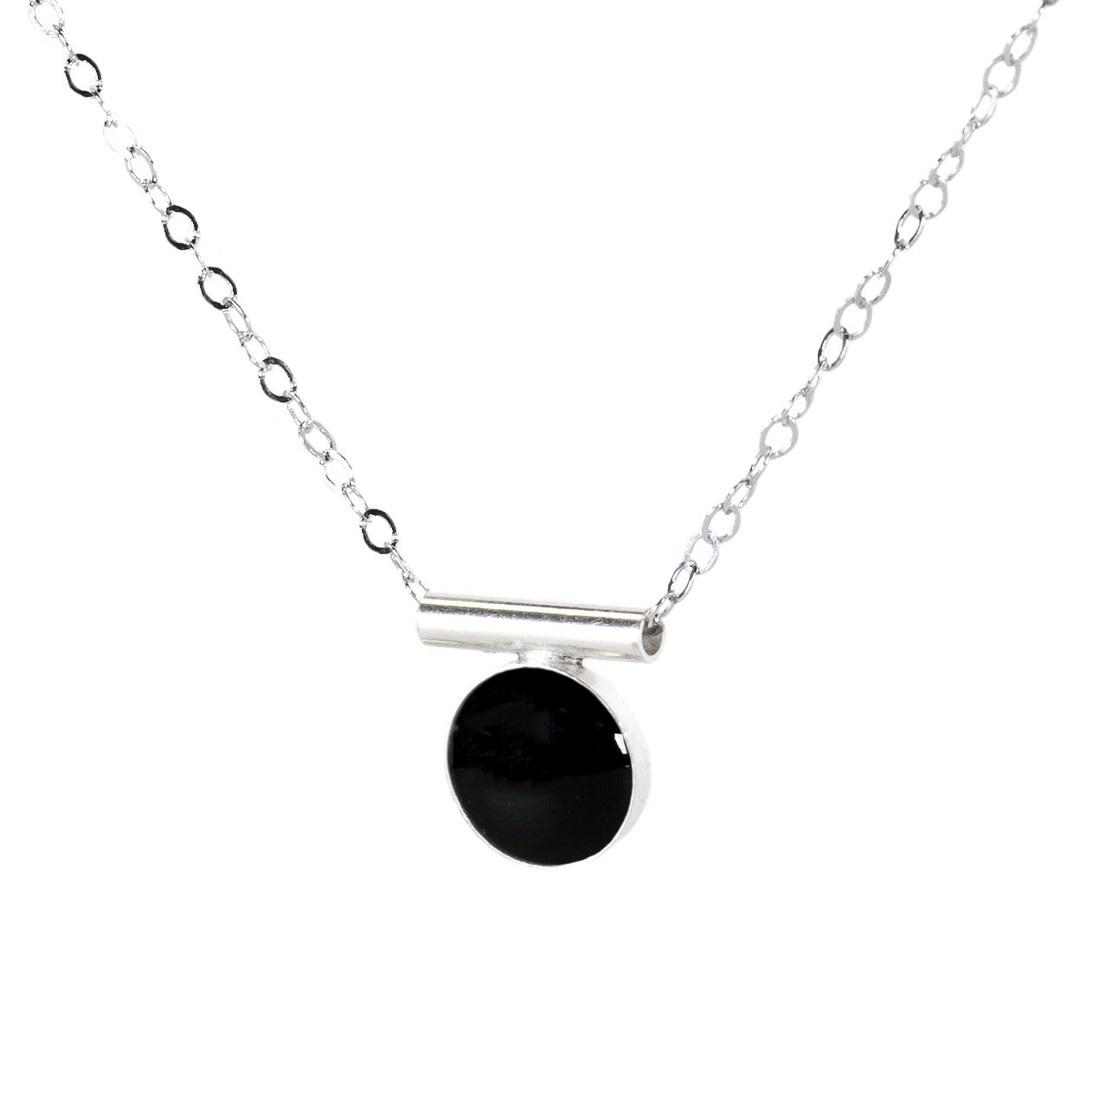 Sable + Co. Sable + Co. Necklaces